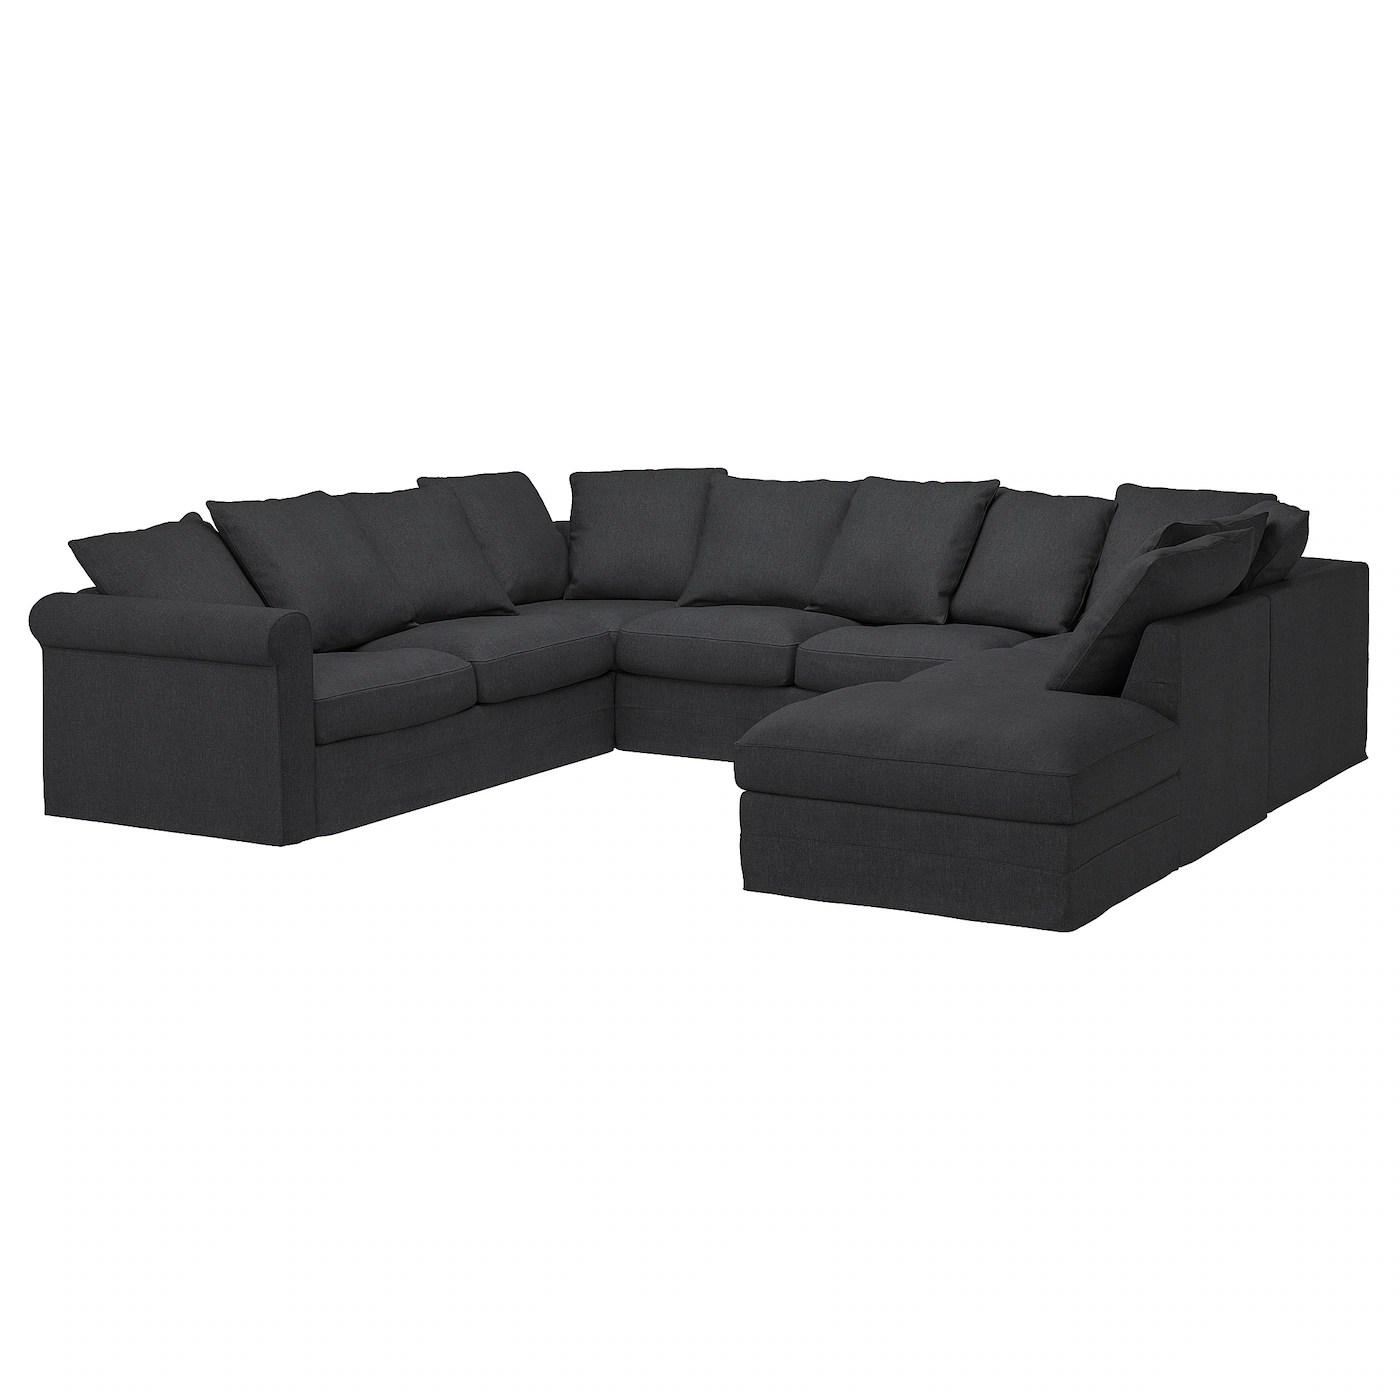 Gronlid U Shaped Sofa 6 Seat With Open End Sporda Dark Grey Ikea